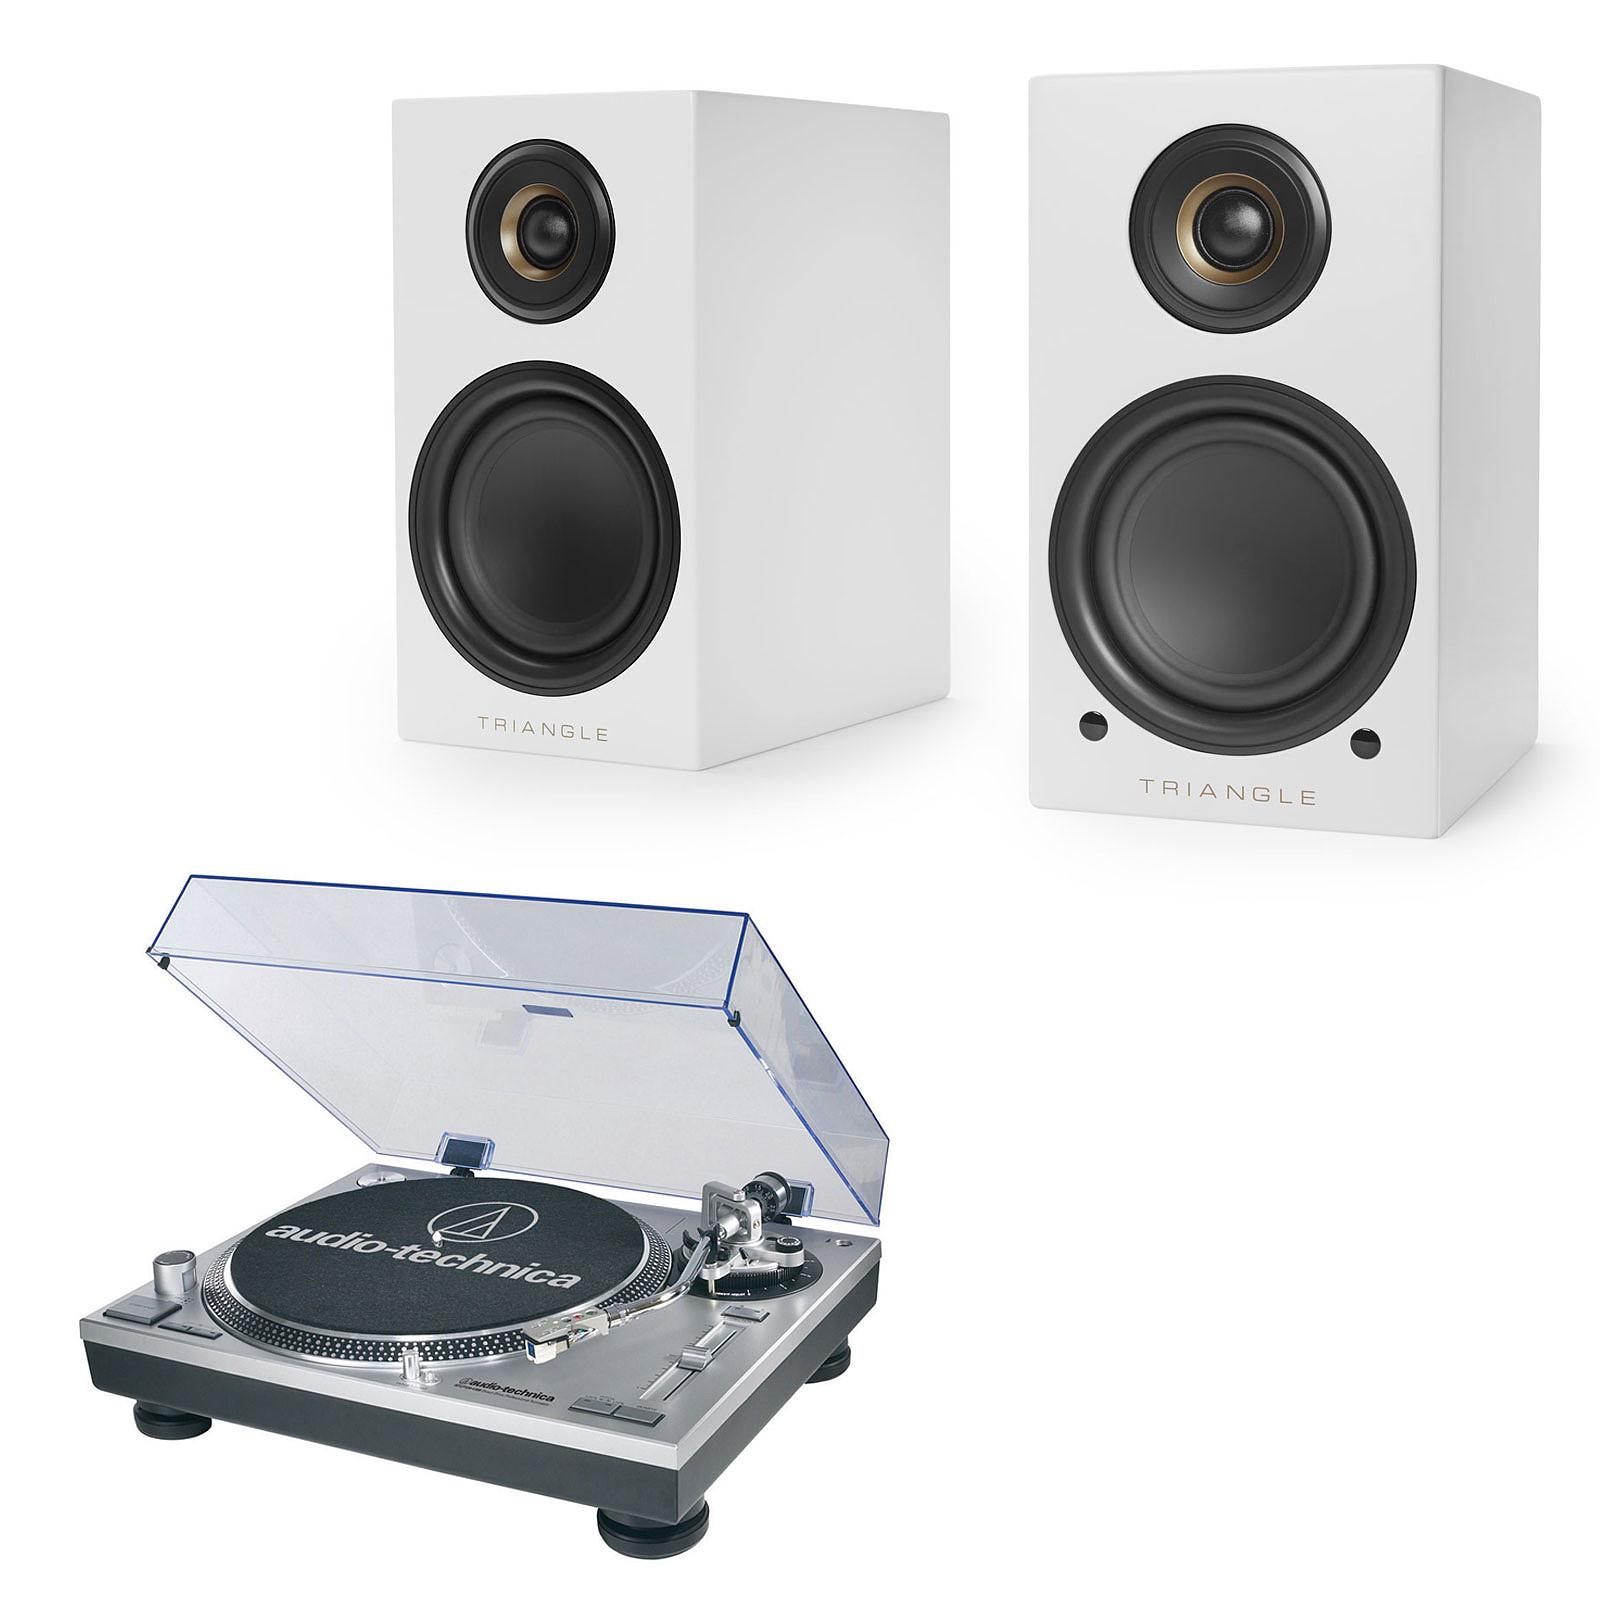 Audio-Technica AT-LP120USBHC + Triangle Elara LN01A Blanc mat